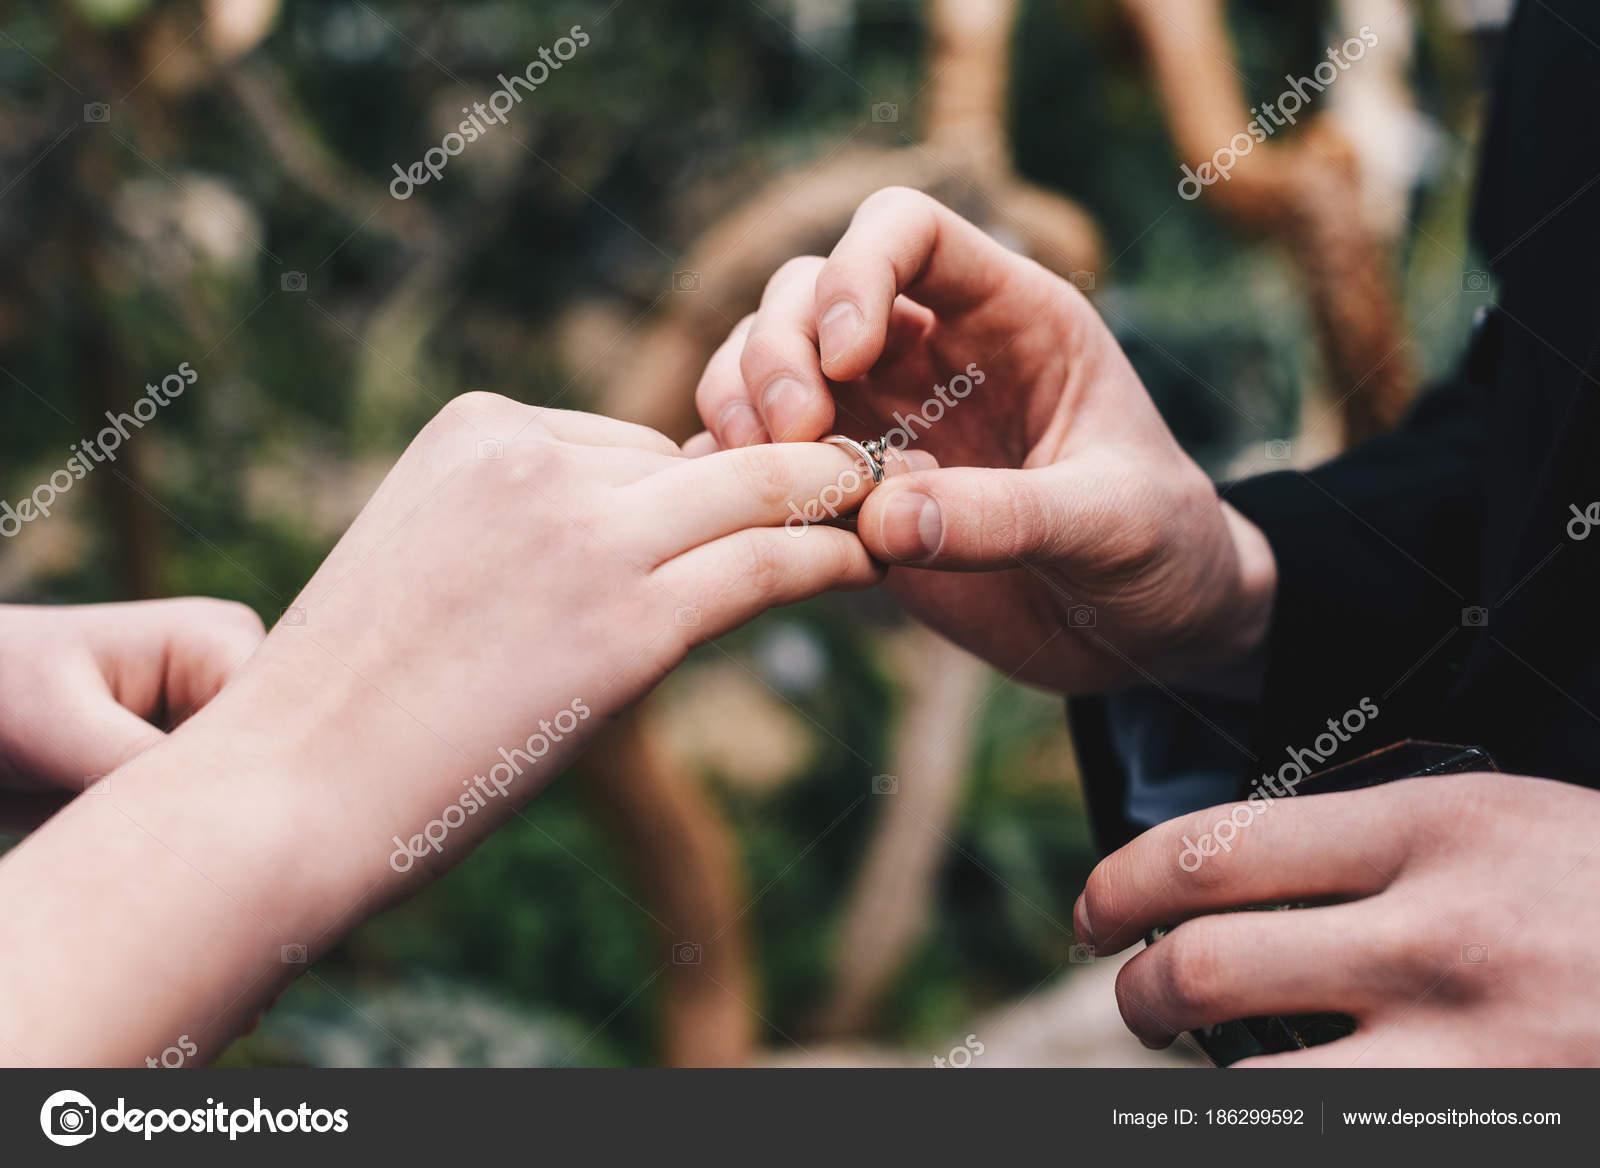 Oriznout Zaber Cloveka Dat Snubni Prsten Prst Mlada Nevesta Stock